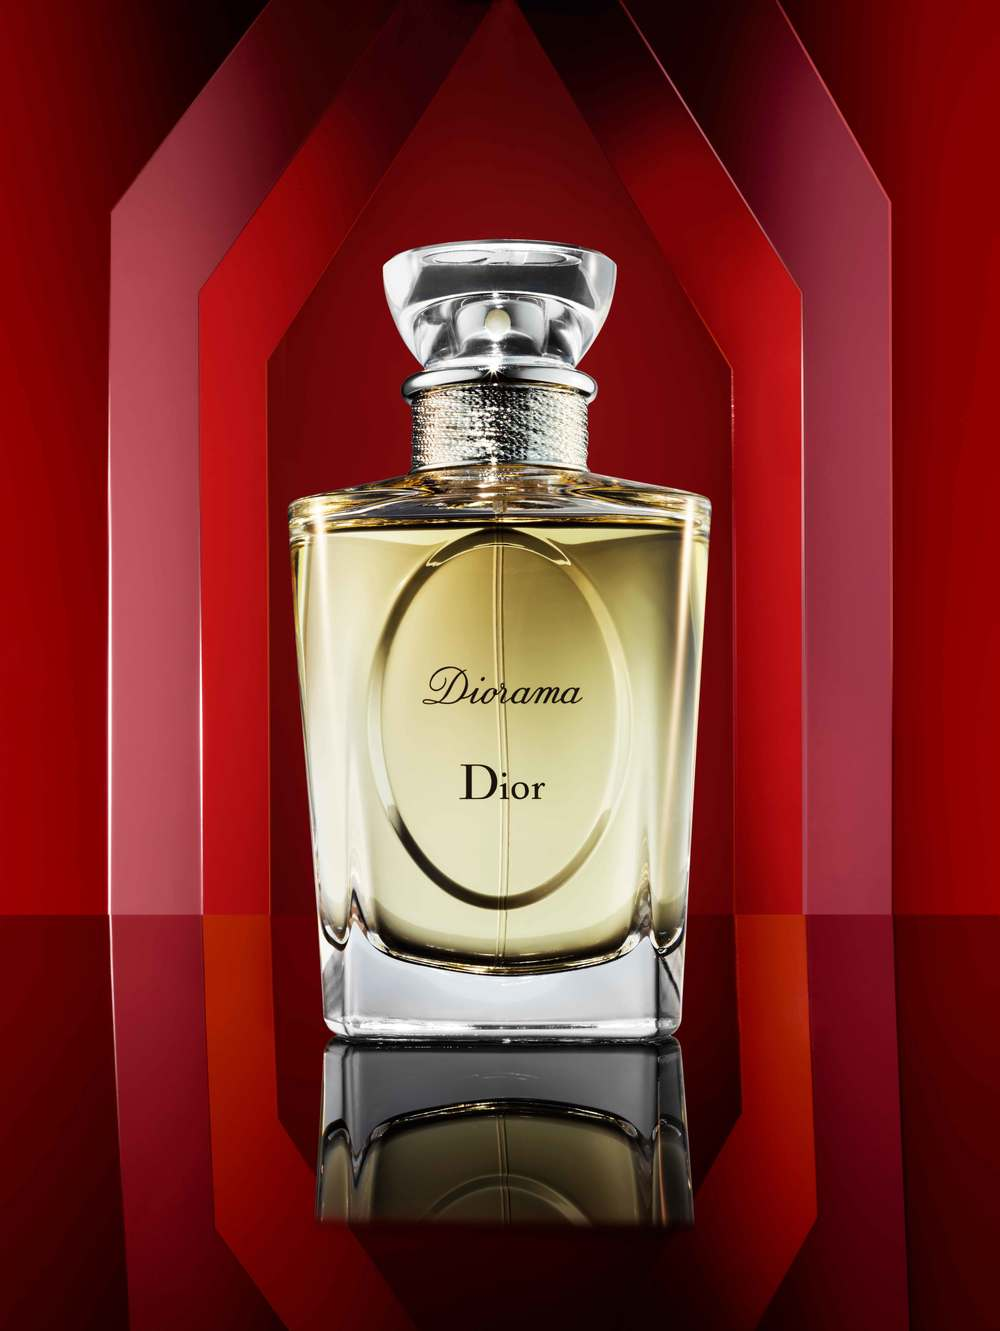 Dior_871c copy.jpg